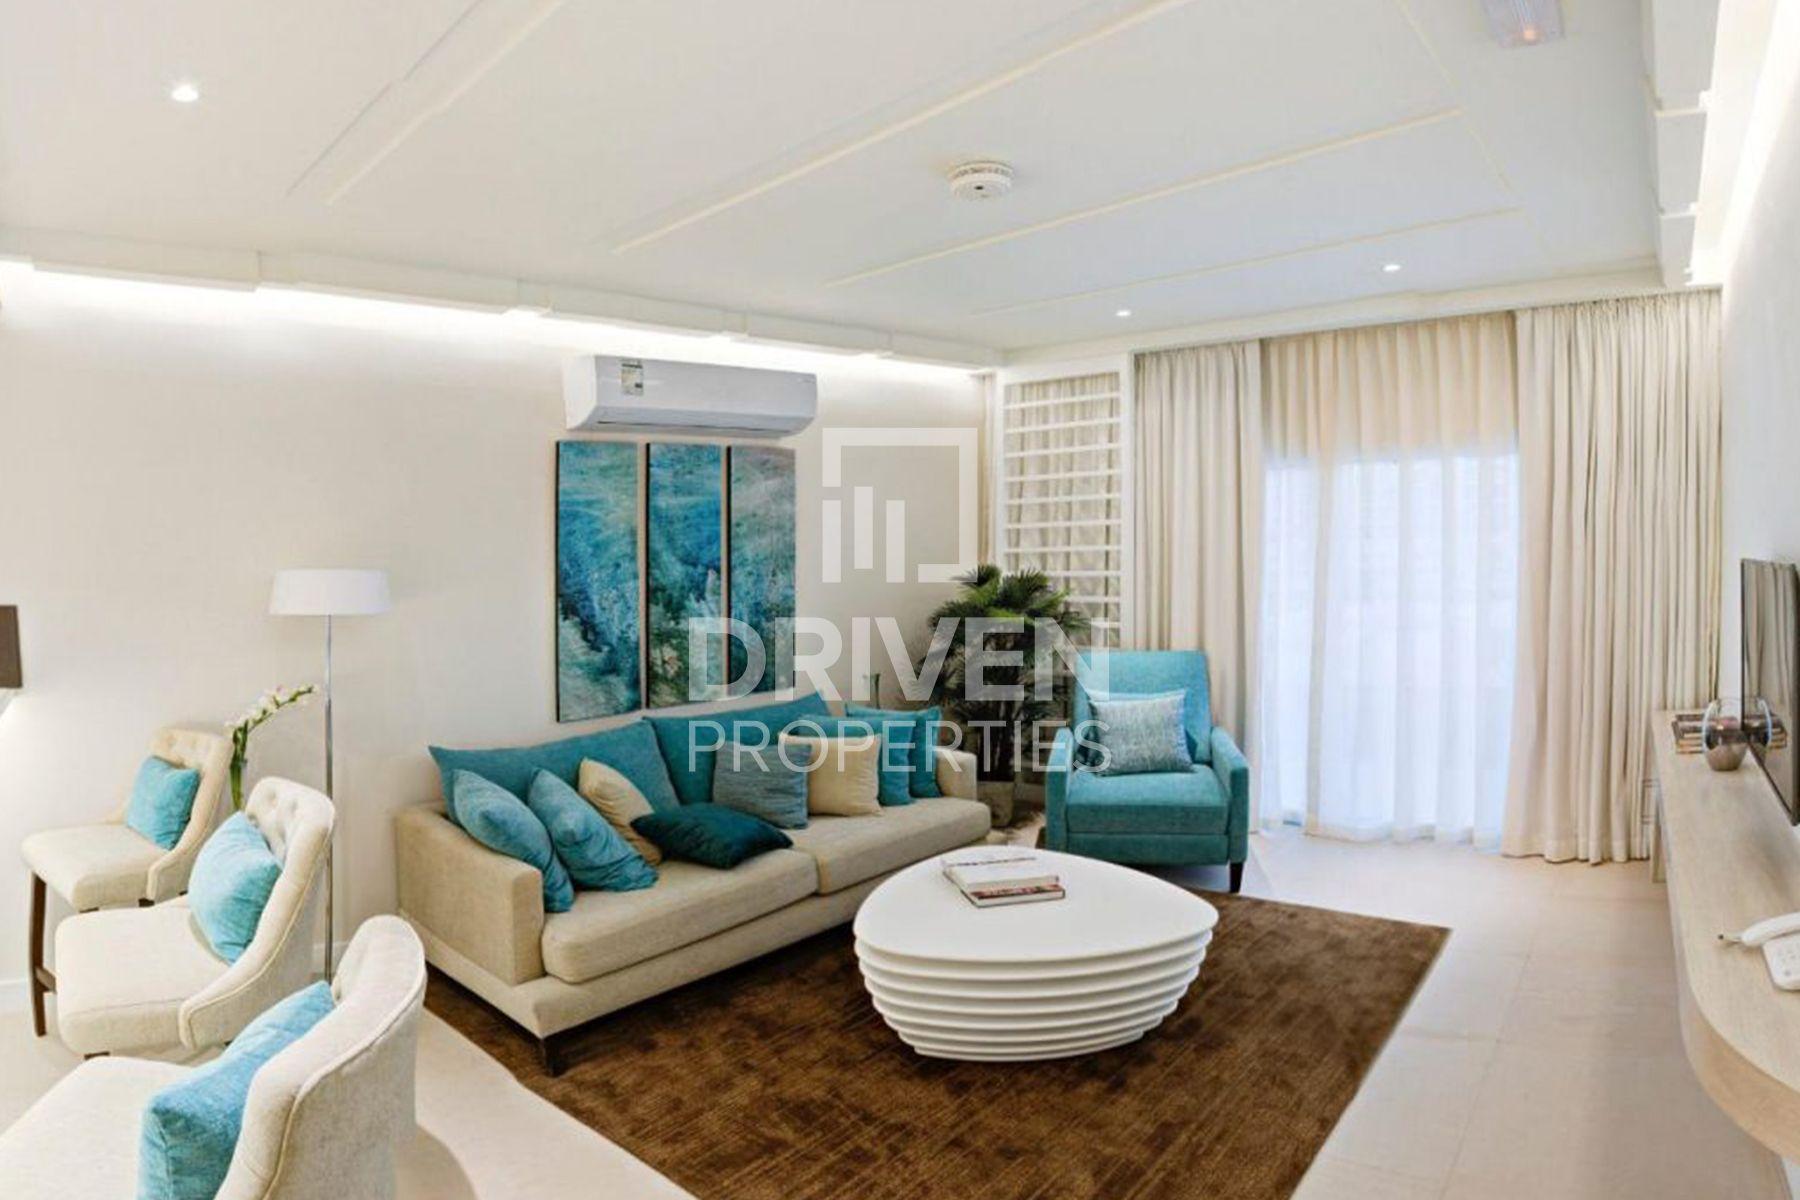 Studio for Sale in Se7en City JLT - Jumeirah Lake Towers